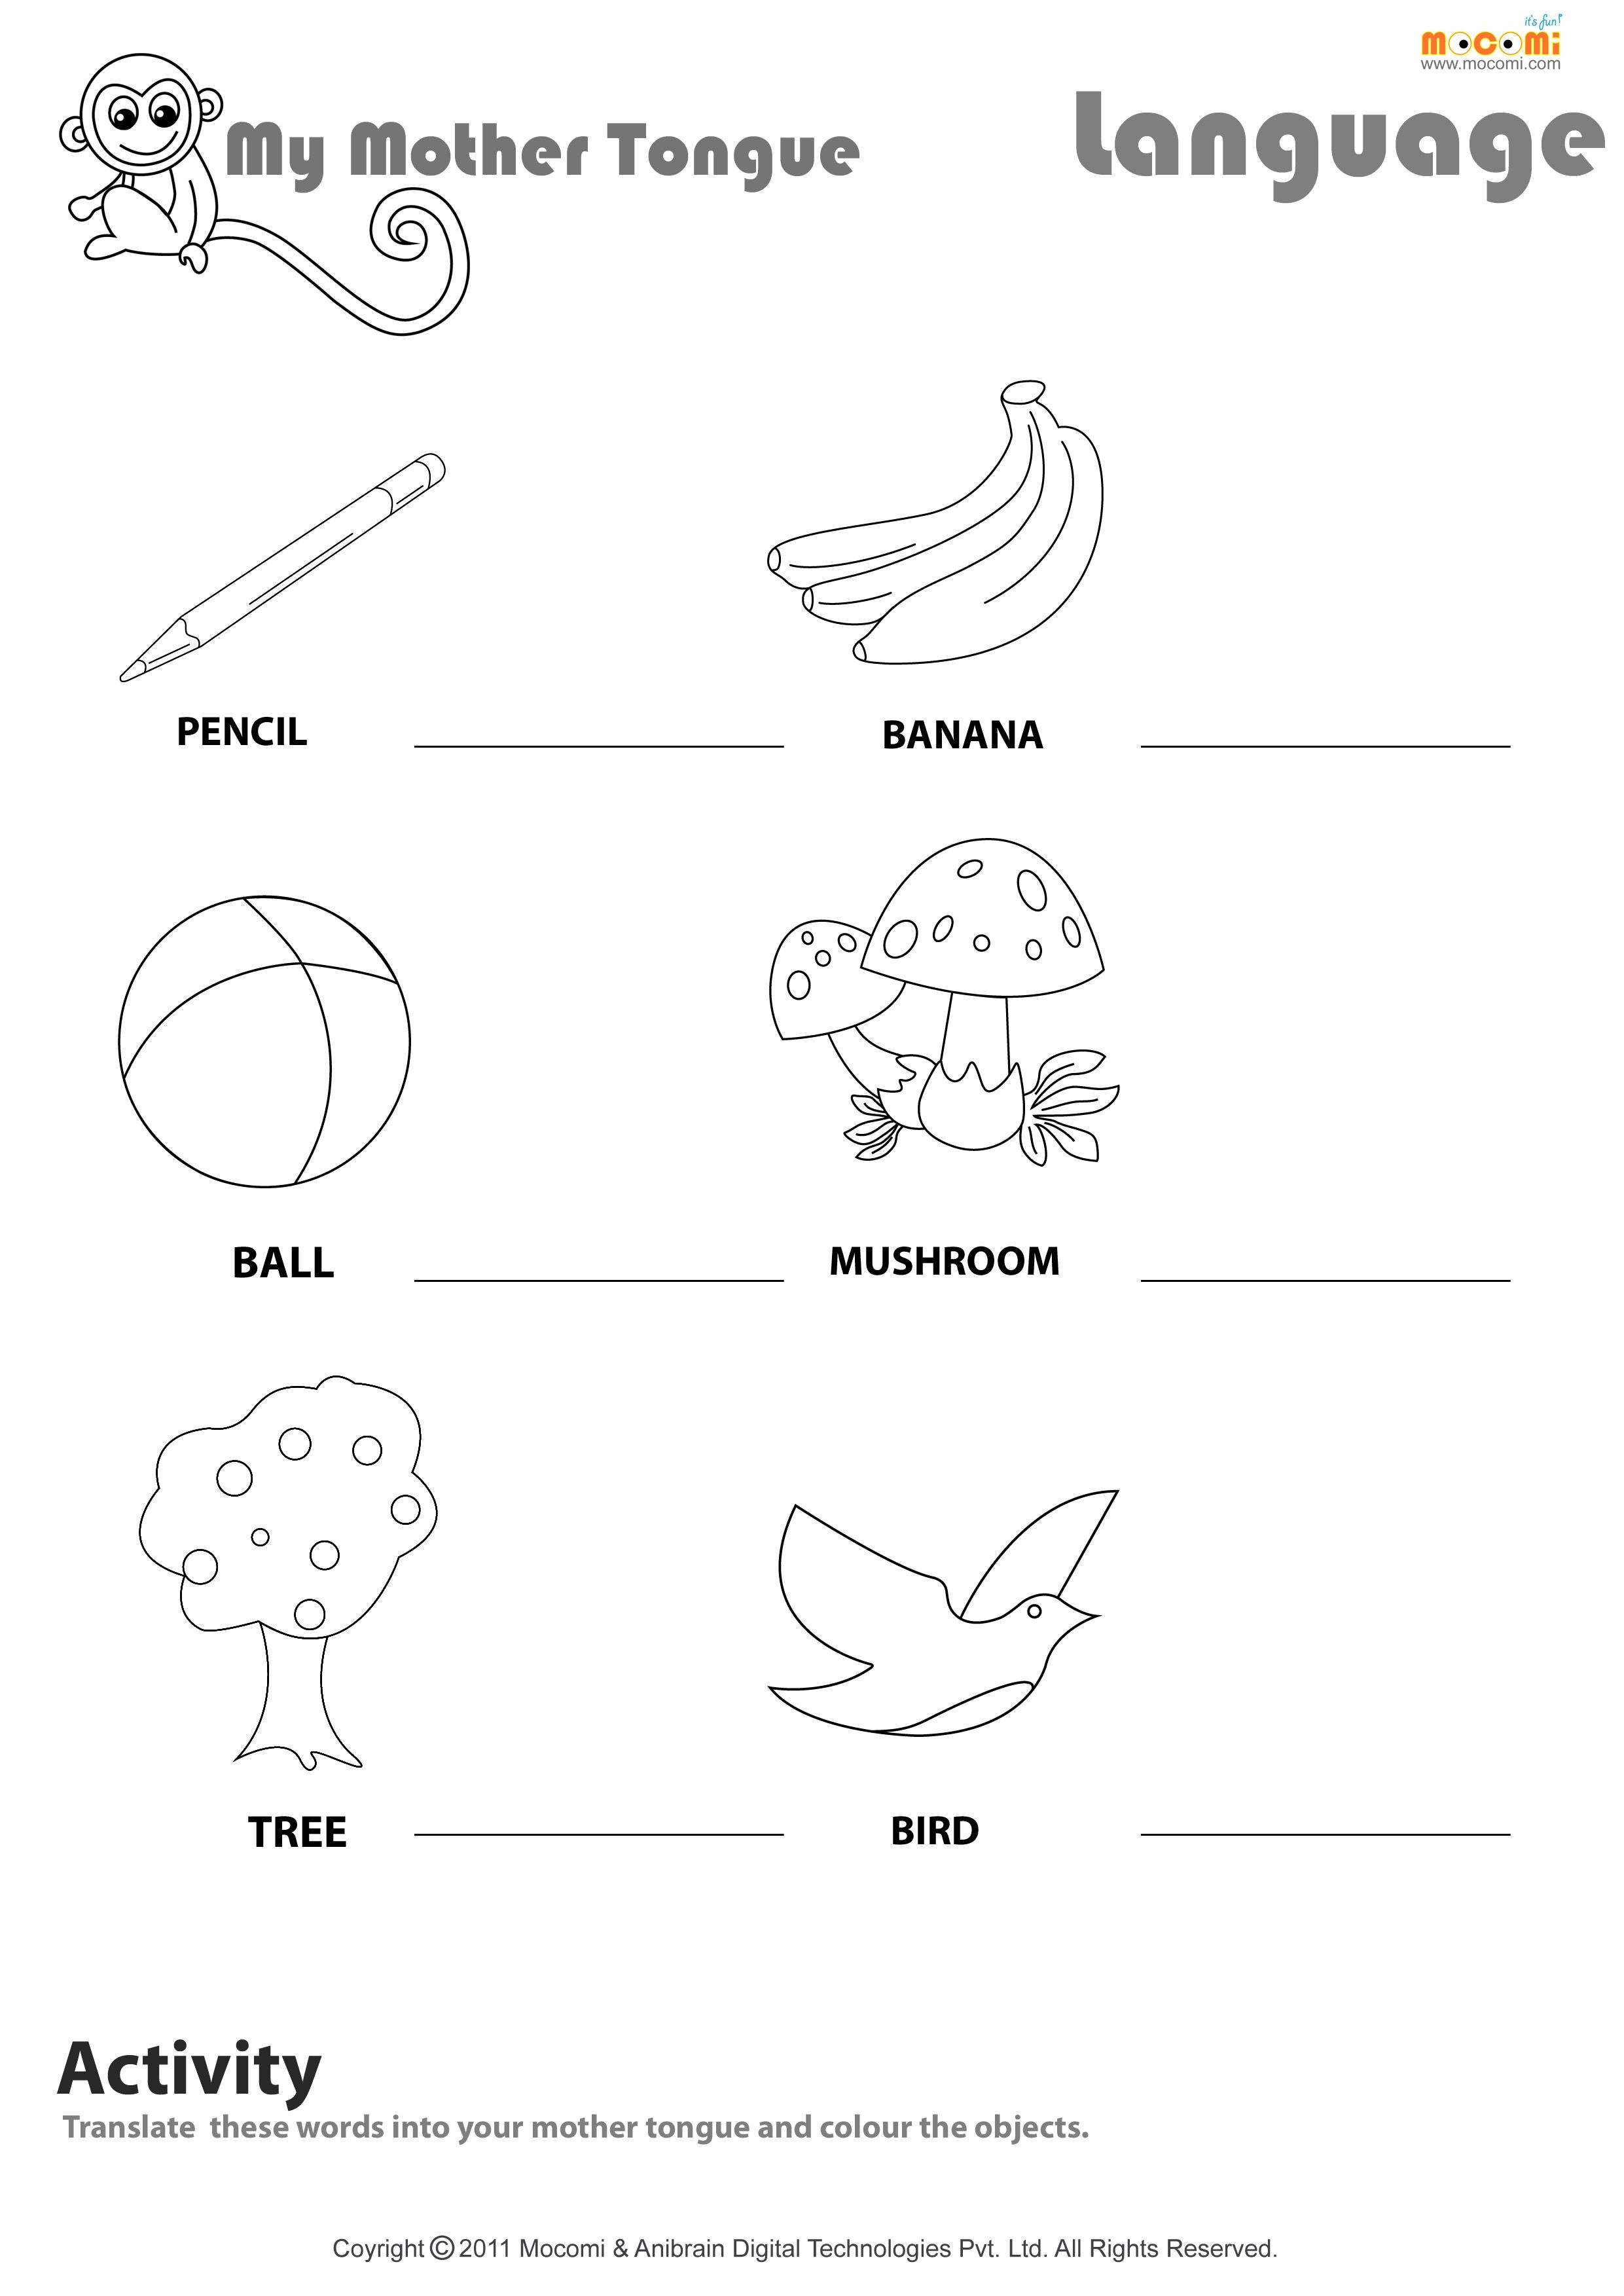 medium resolution of My mother tongue - English Worksheet for Kids   Mocomi   Fun worksheets for  kids